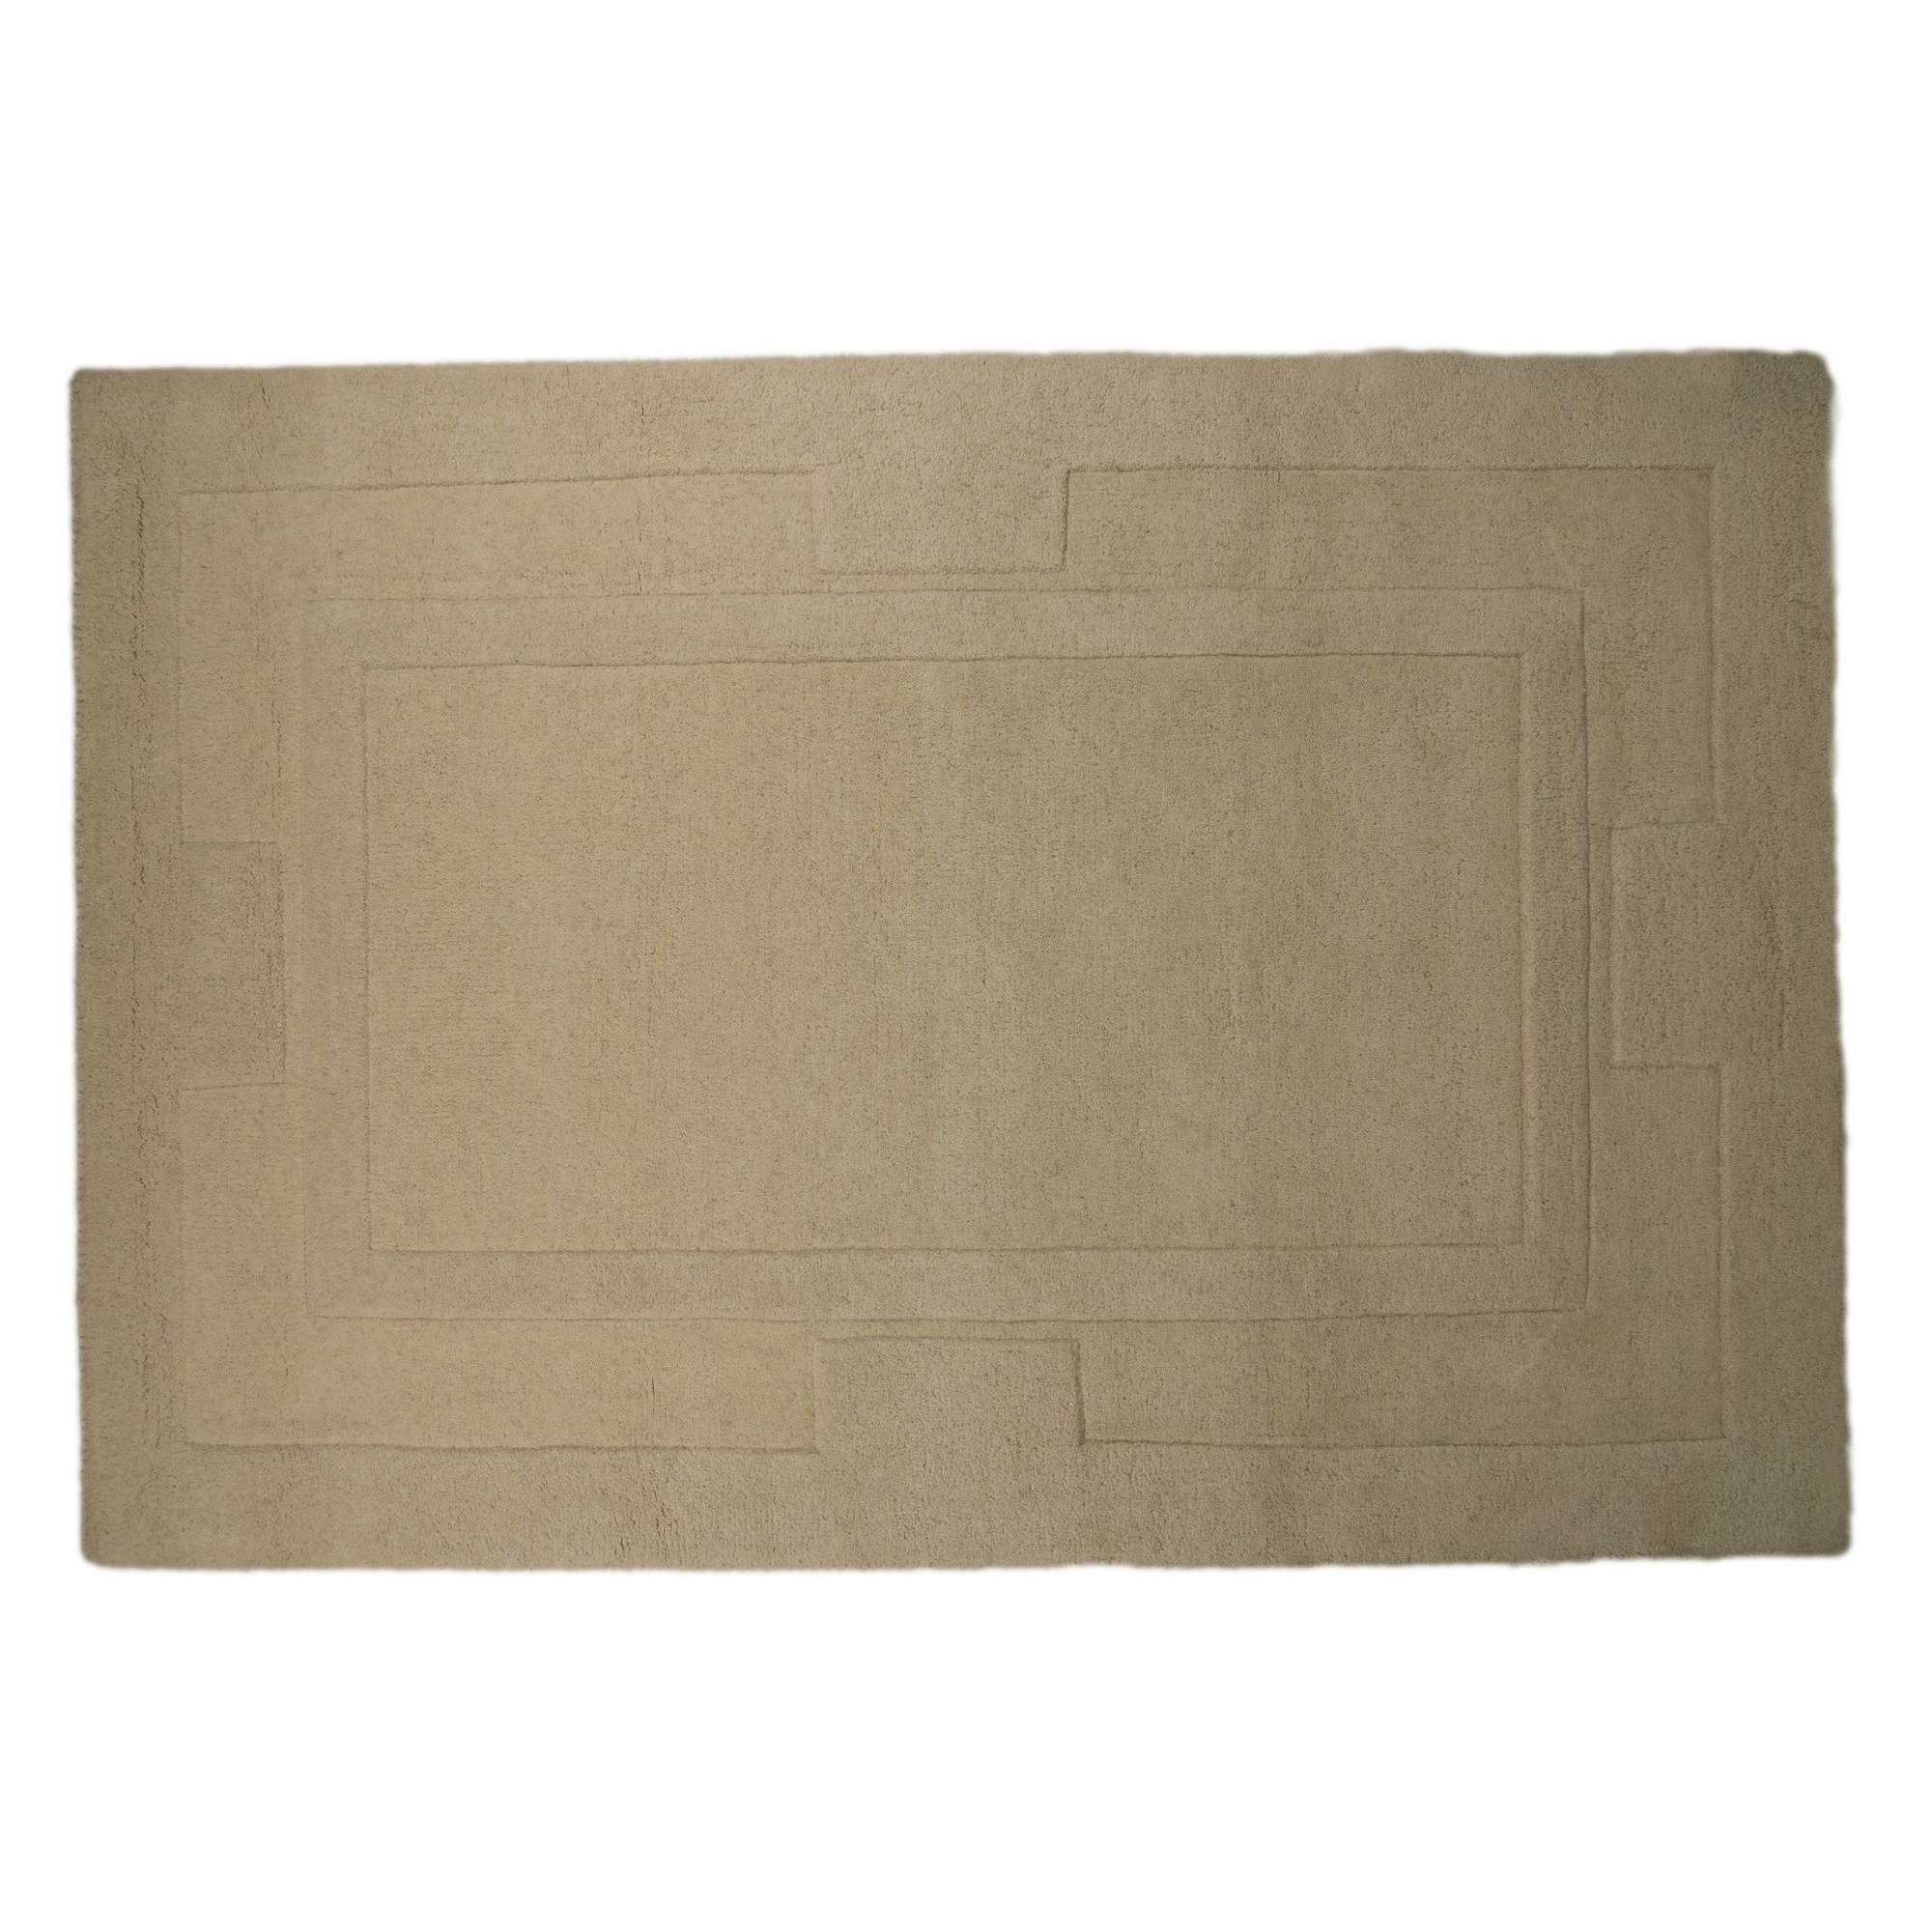 Flair Rugs Sierra Apollo - Tapis 100% laine (FR207) | | | Caracteristique  bff3e3